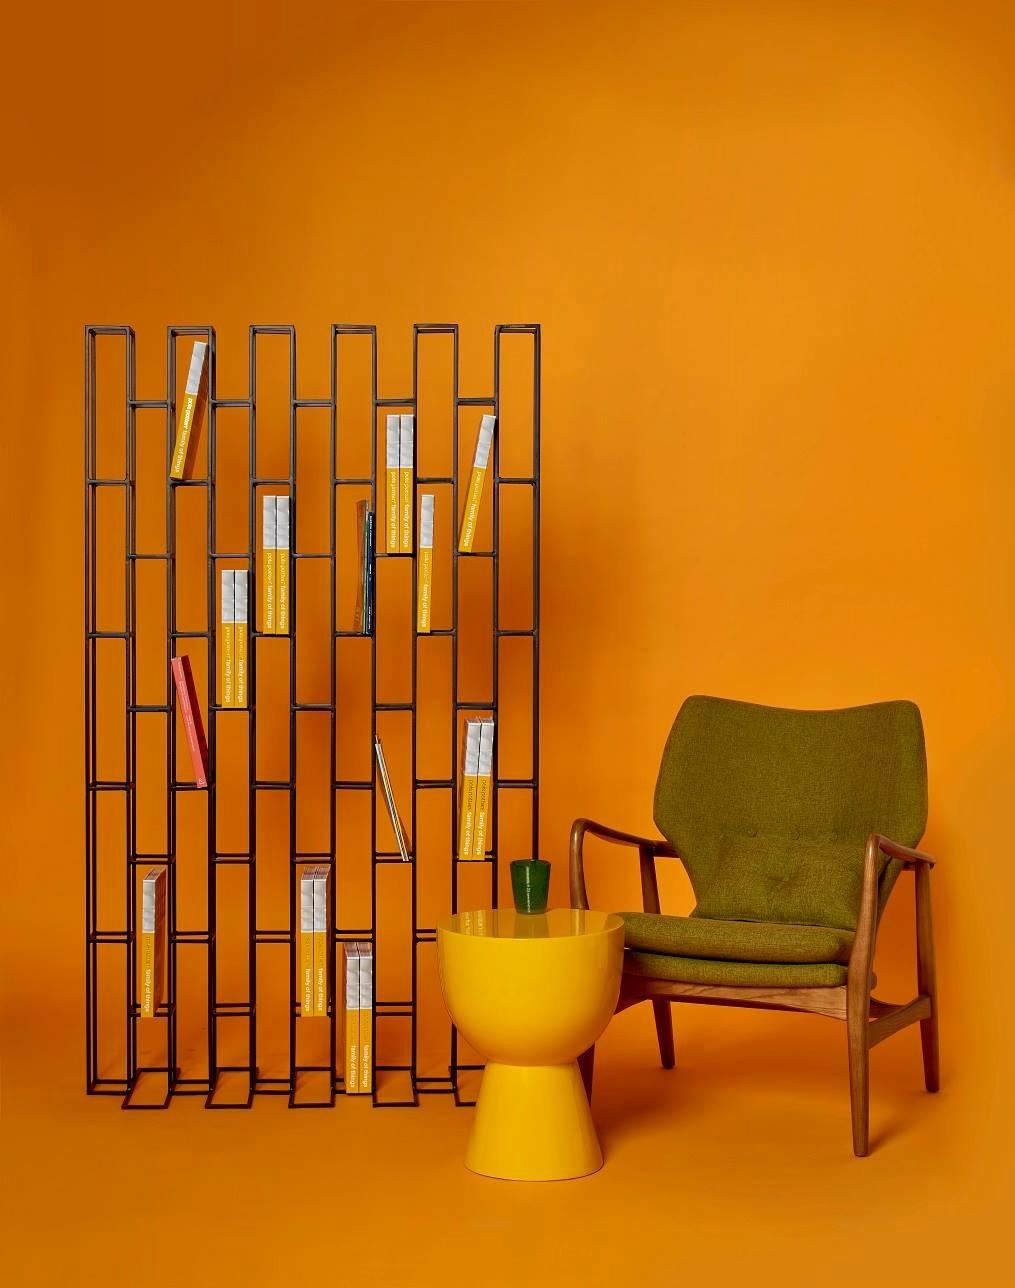 Bookcase Room Divider Bricks Standing On Behance